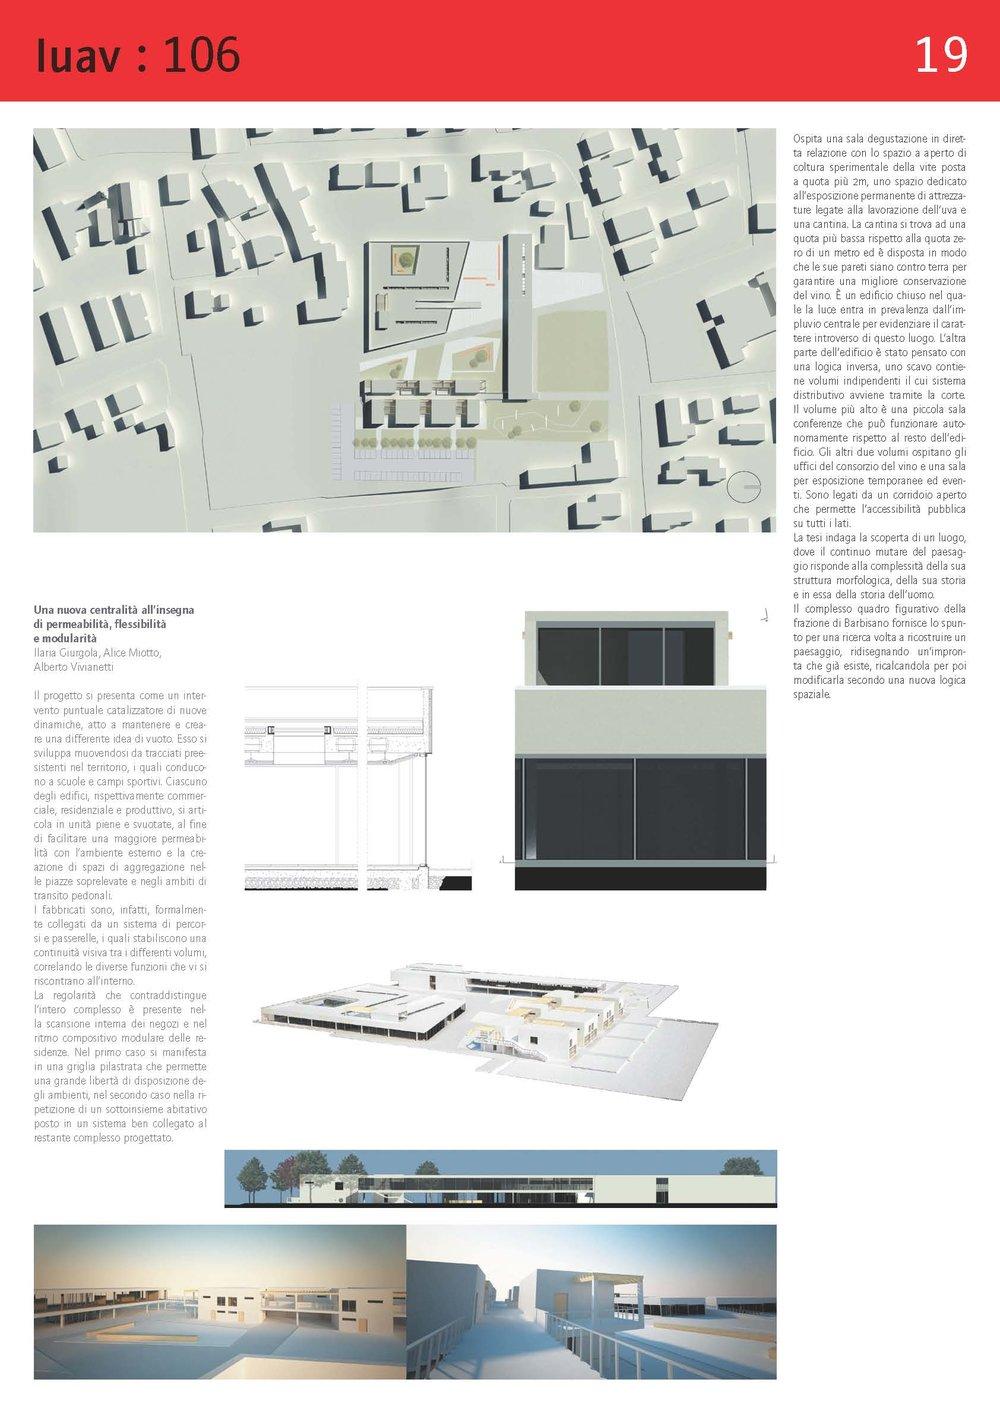 Copertine_Pagina_20.jpg